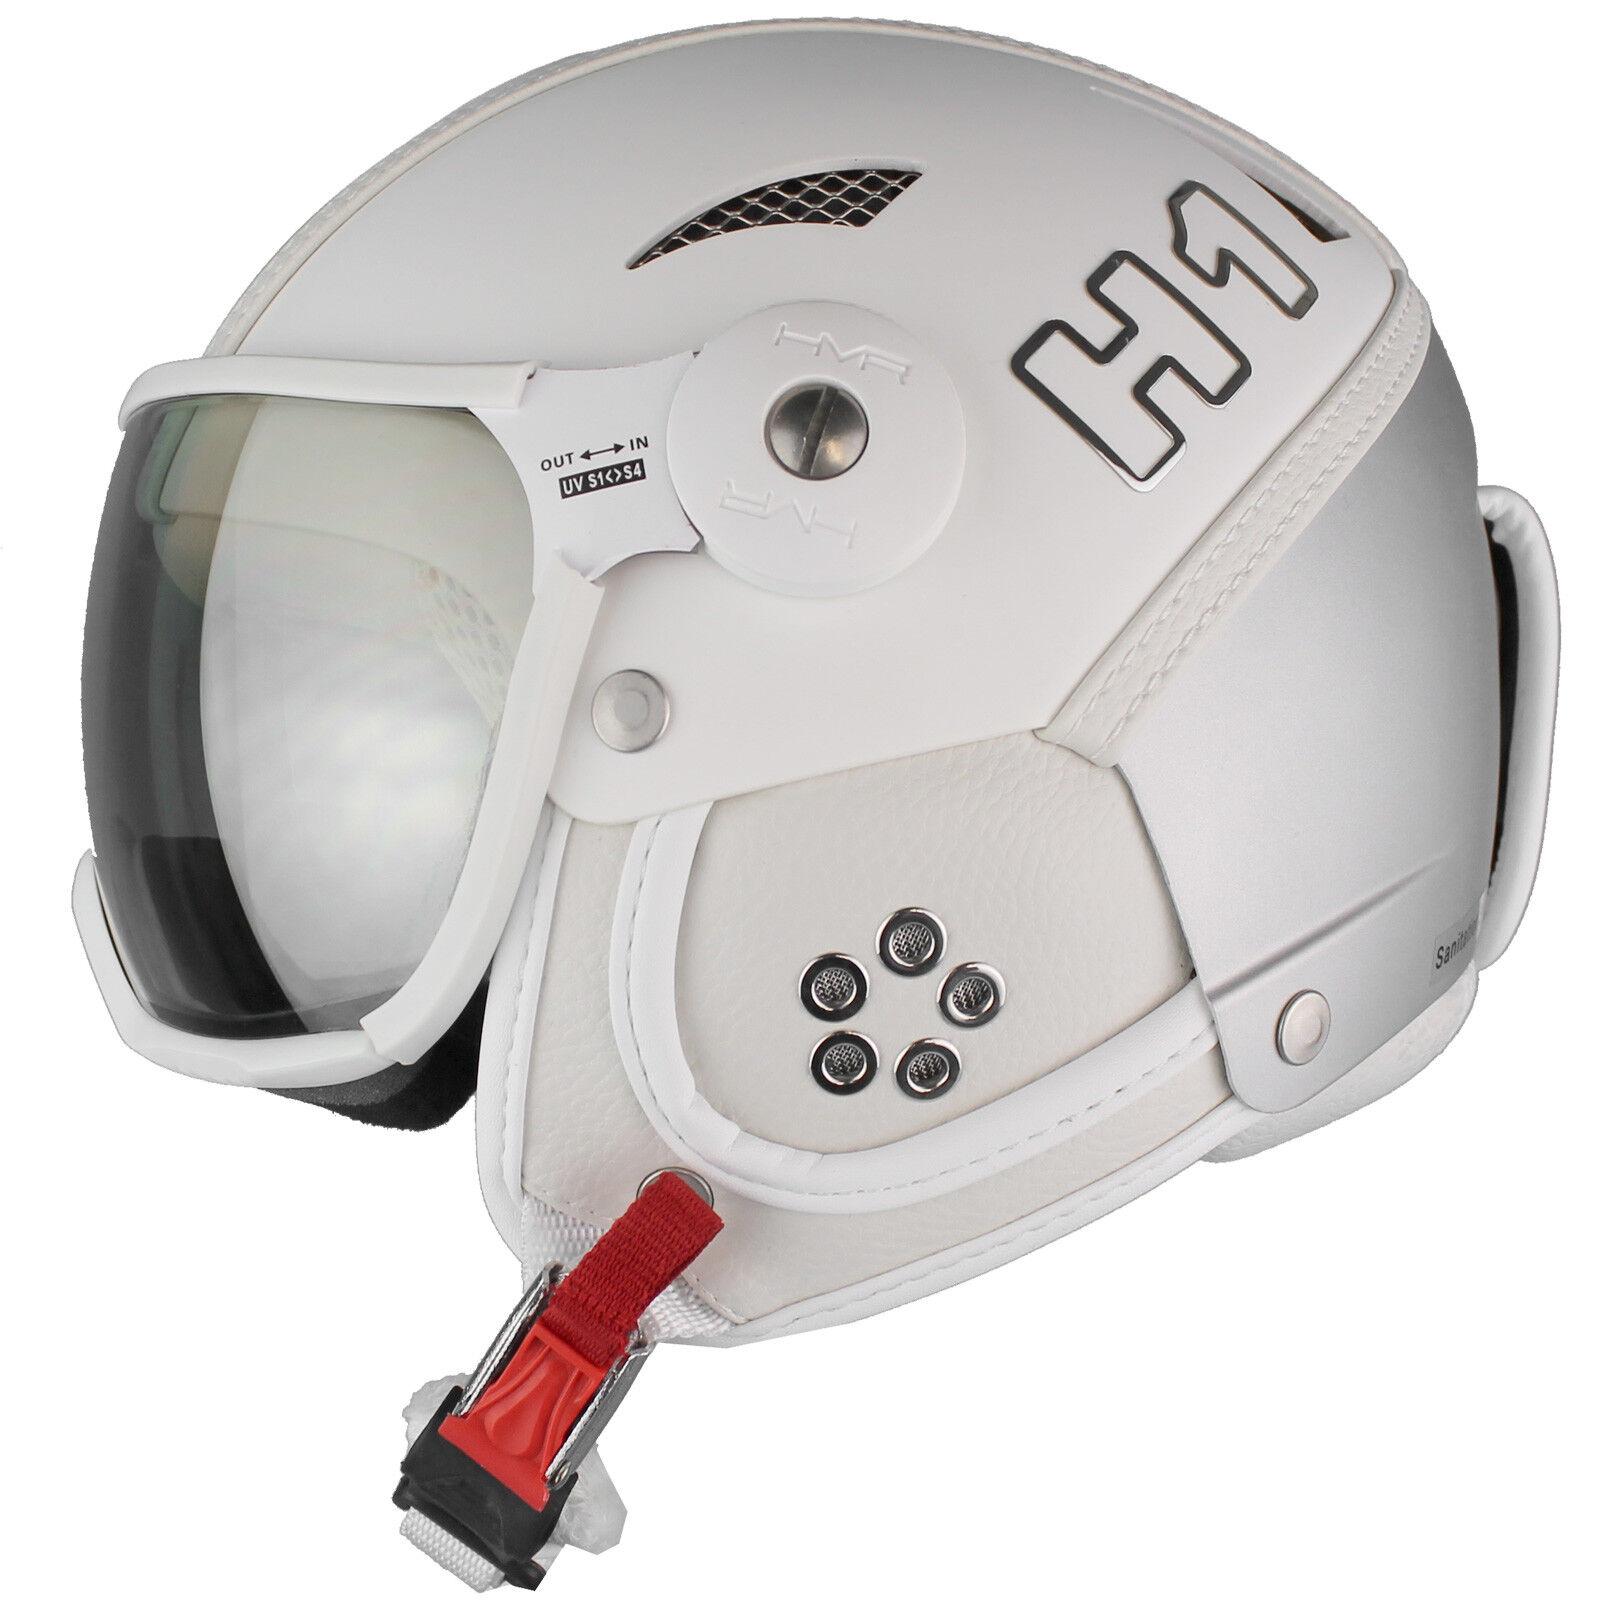 HMR H1 Skihelm Snowboardhelm Visierhelm mit aktiver Belüftung Ski Snowboard Helm